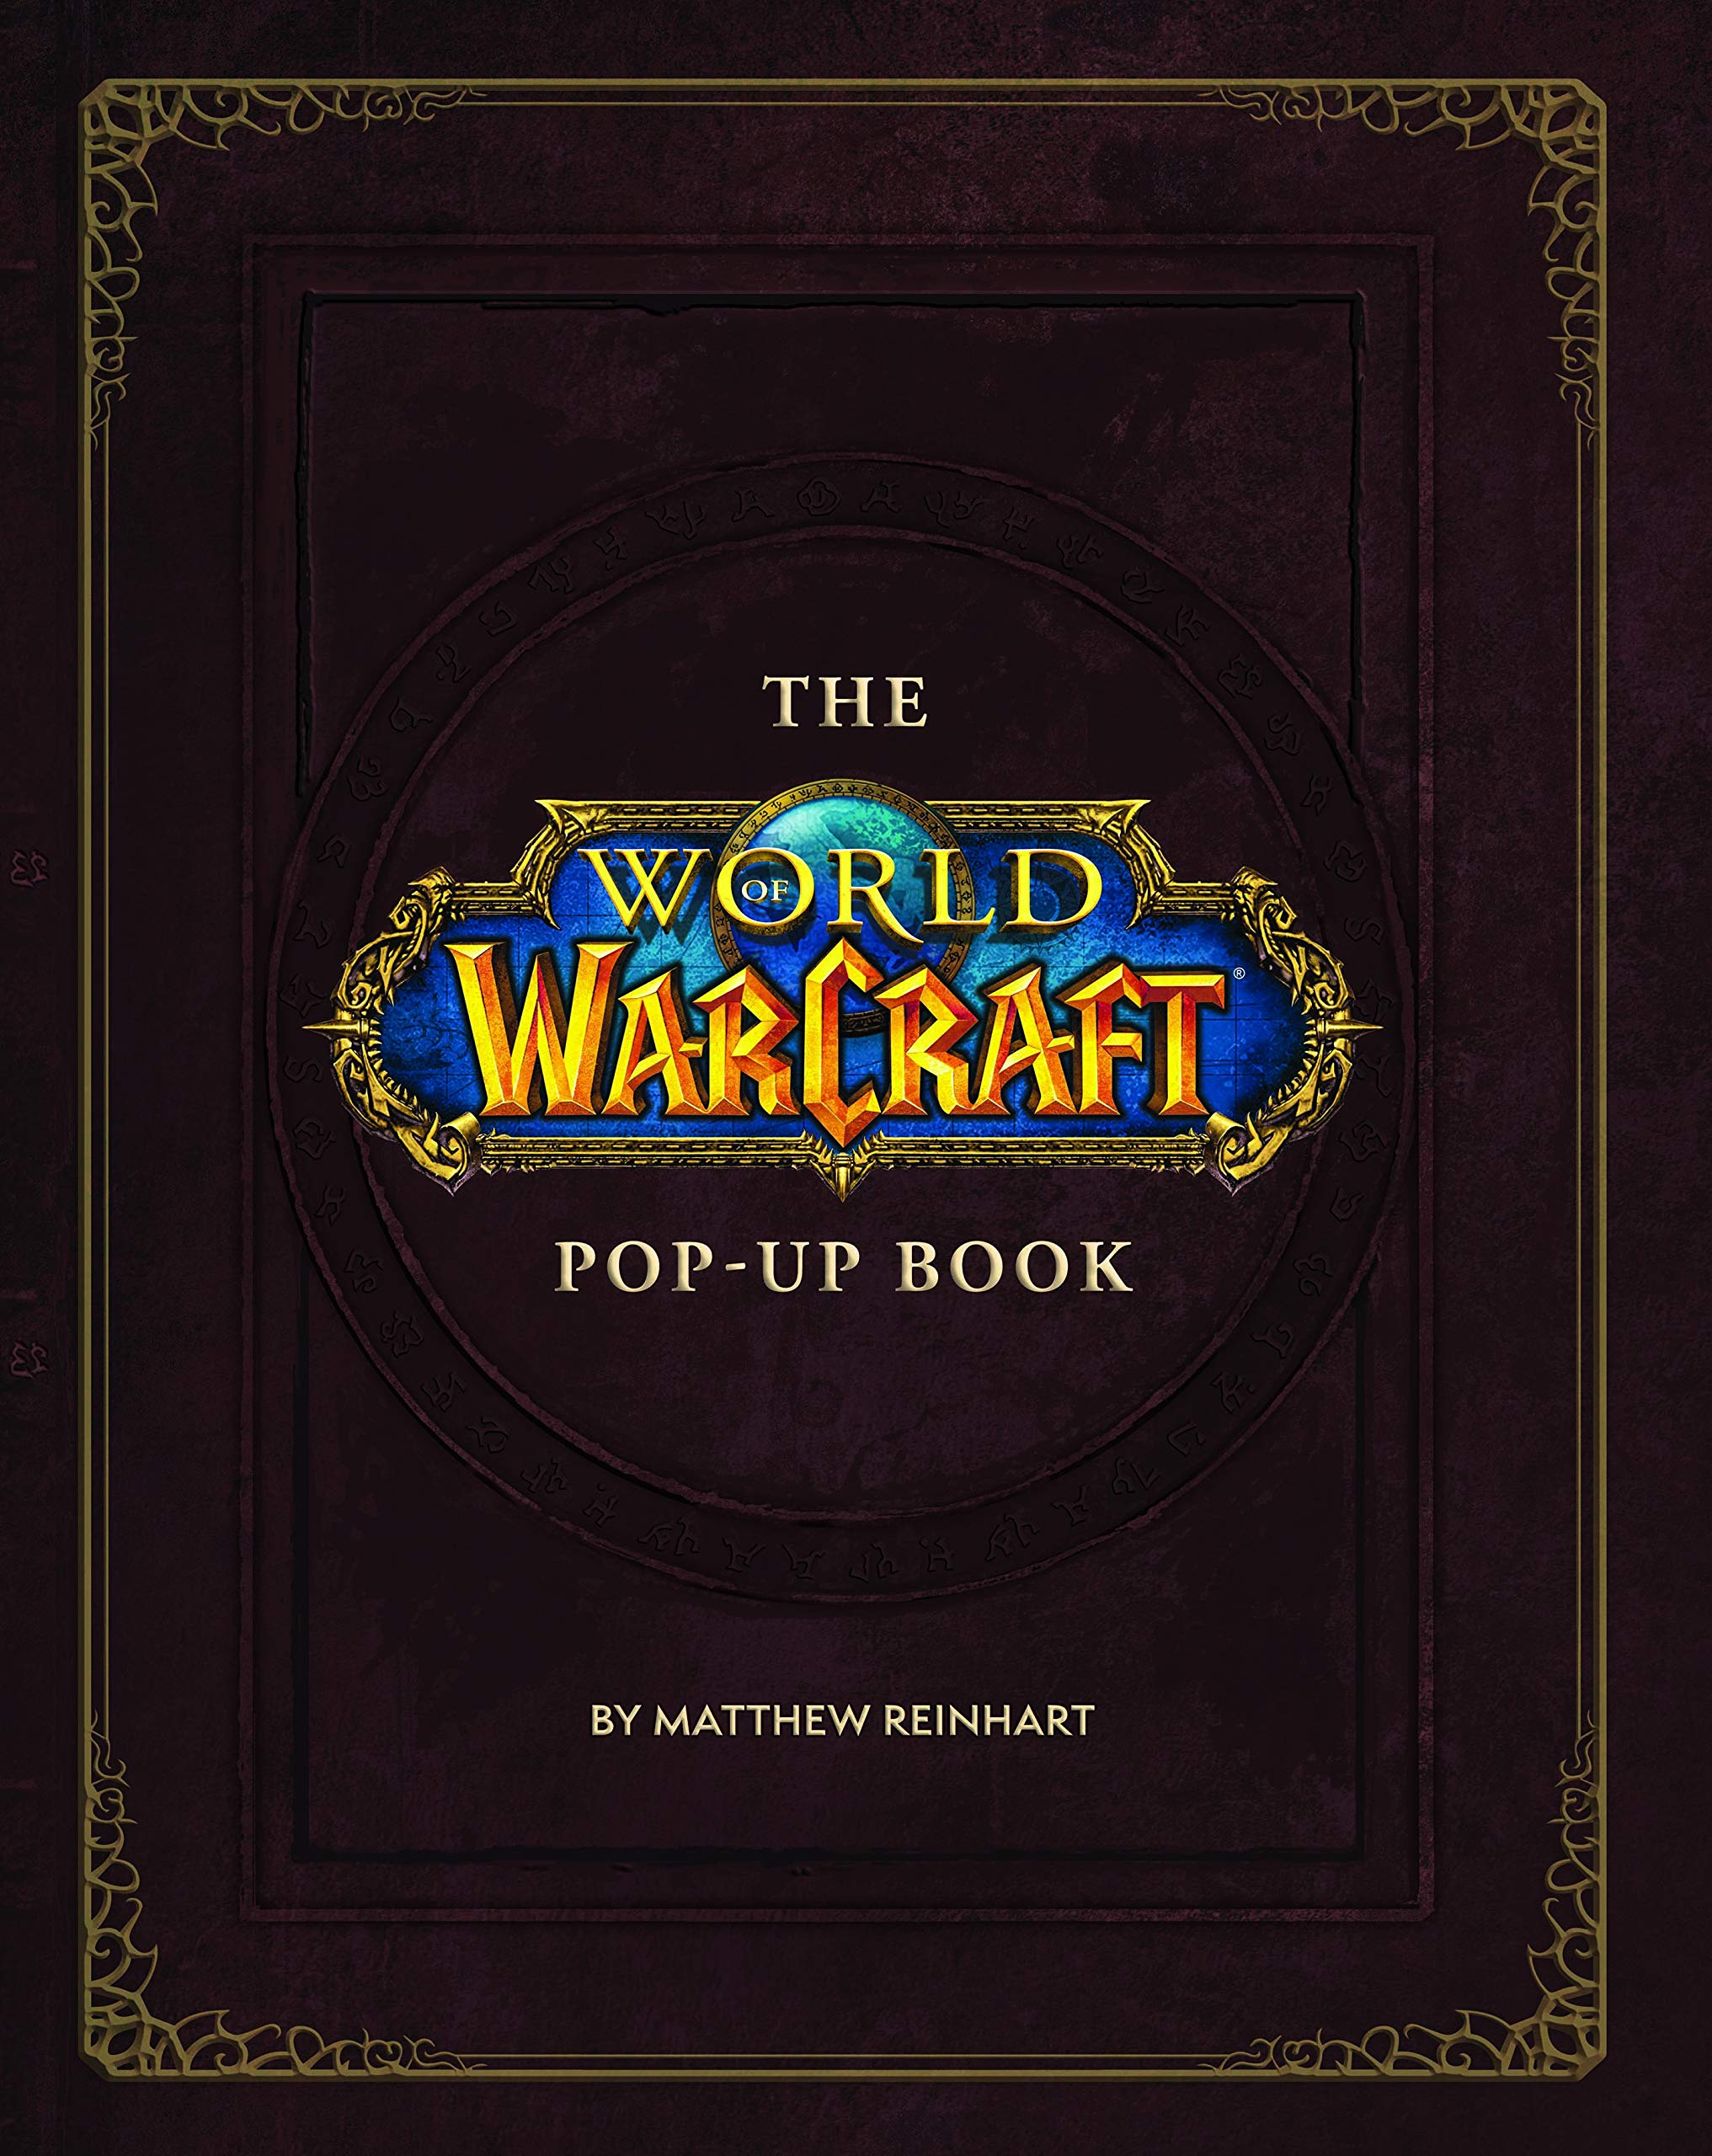 The World of Warcraft Pop-Up Book: Amazon co uk: Robert